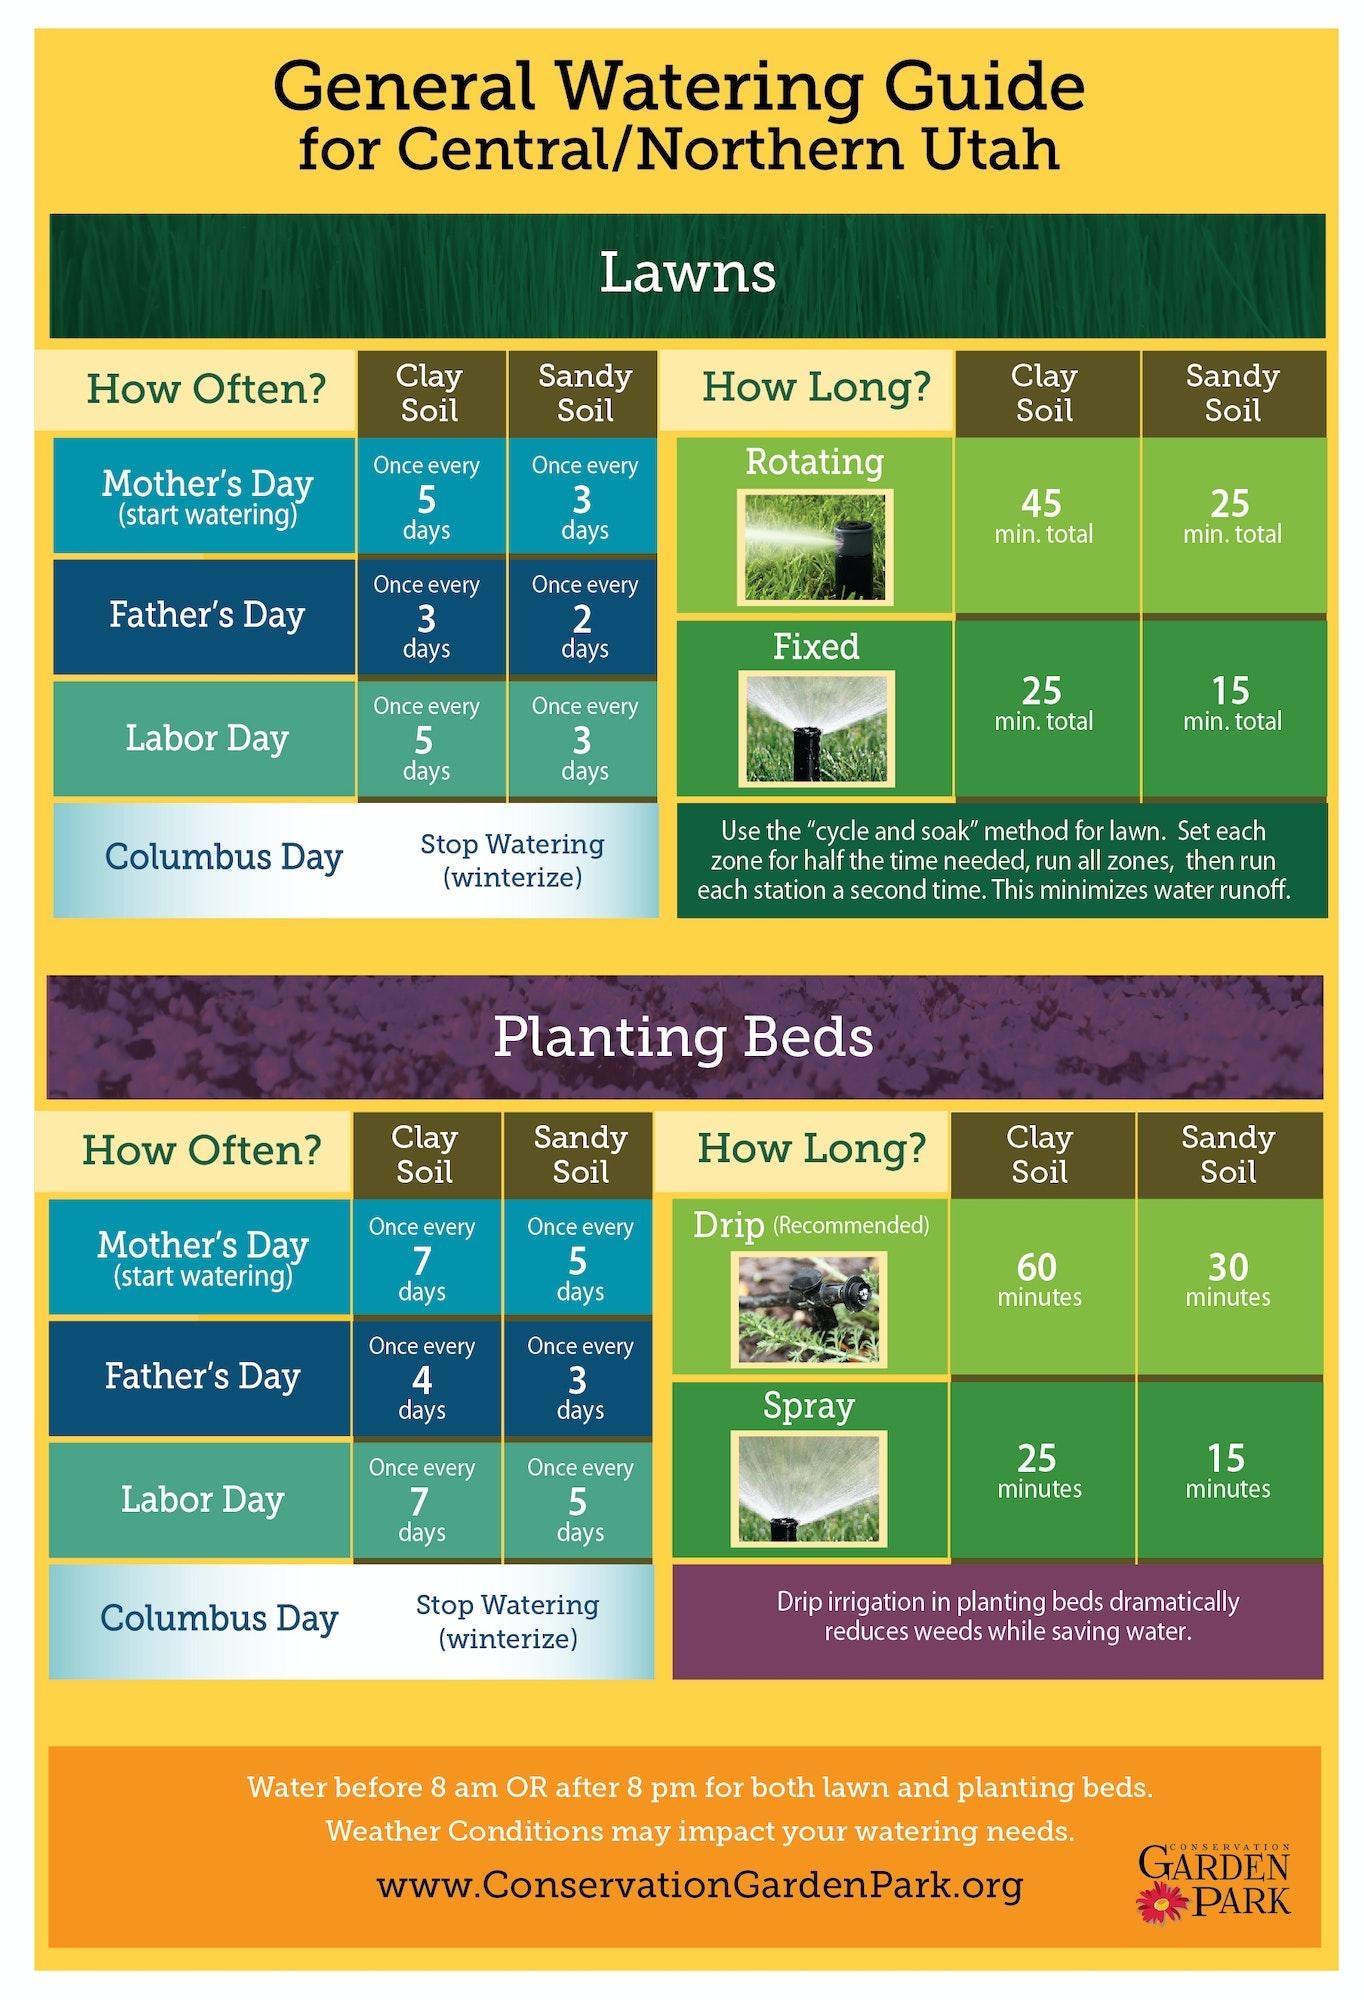 jvwcd.org lawn watering guide